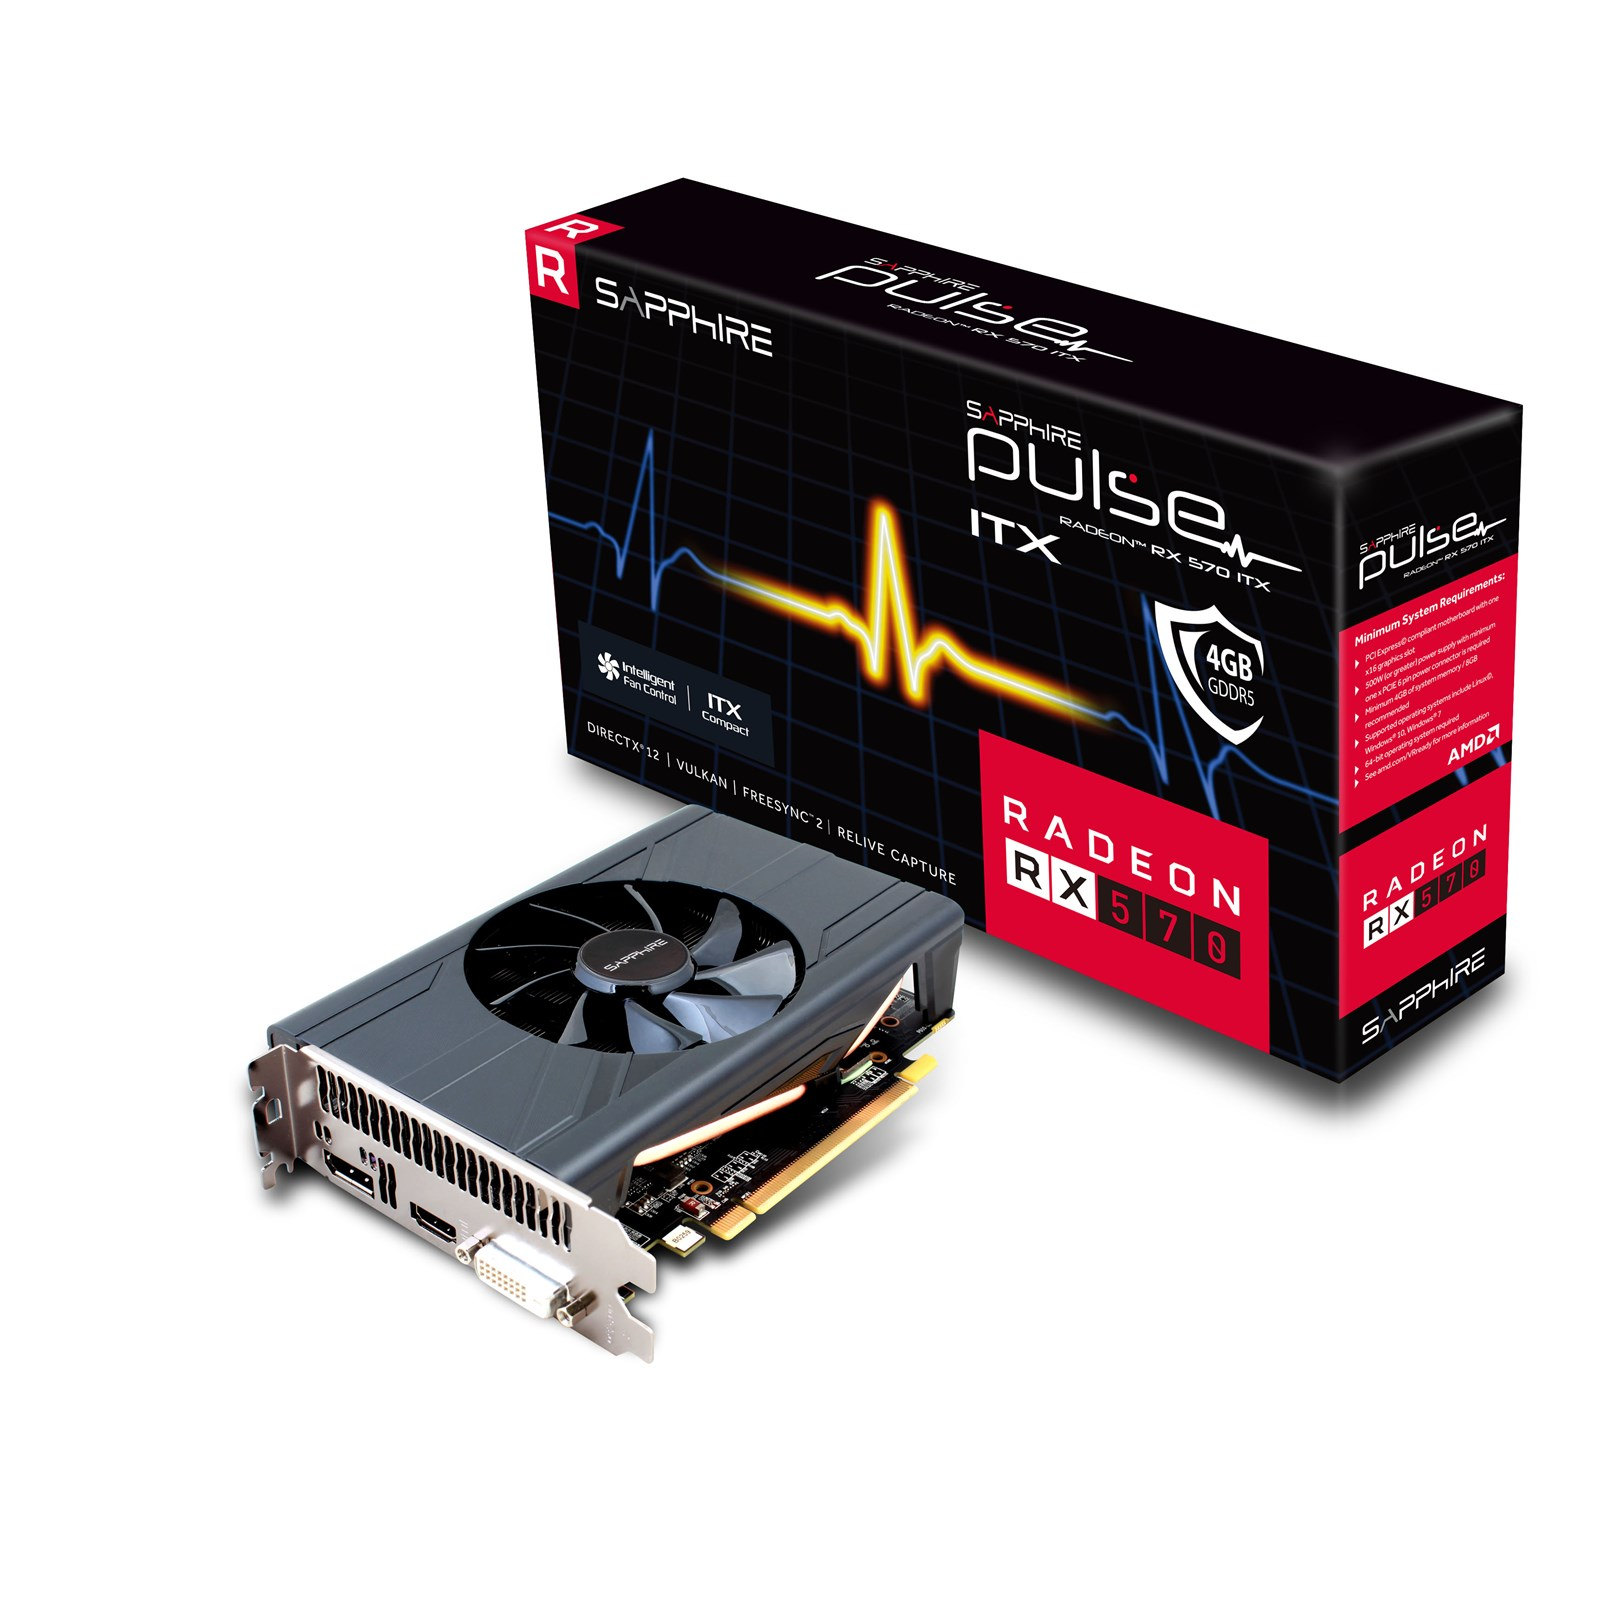 Sapphire Radeon RX 570 Pulse ITX 4GB Graphics Card - 11266-34-20G